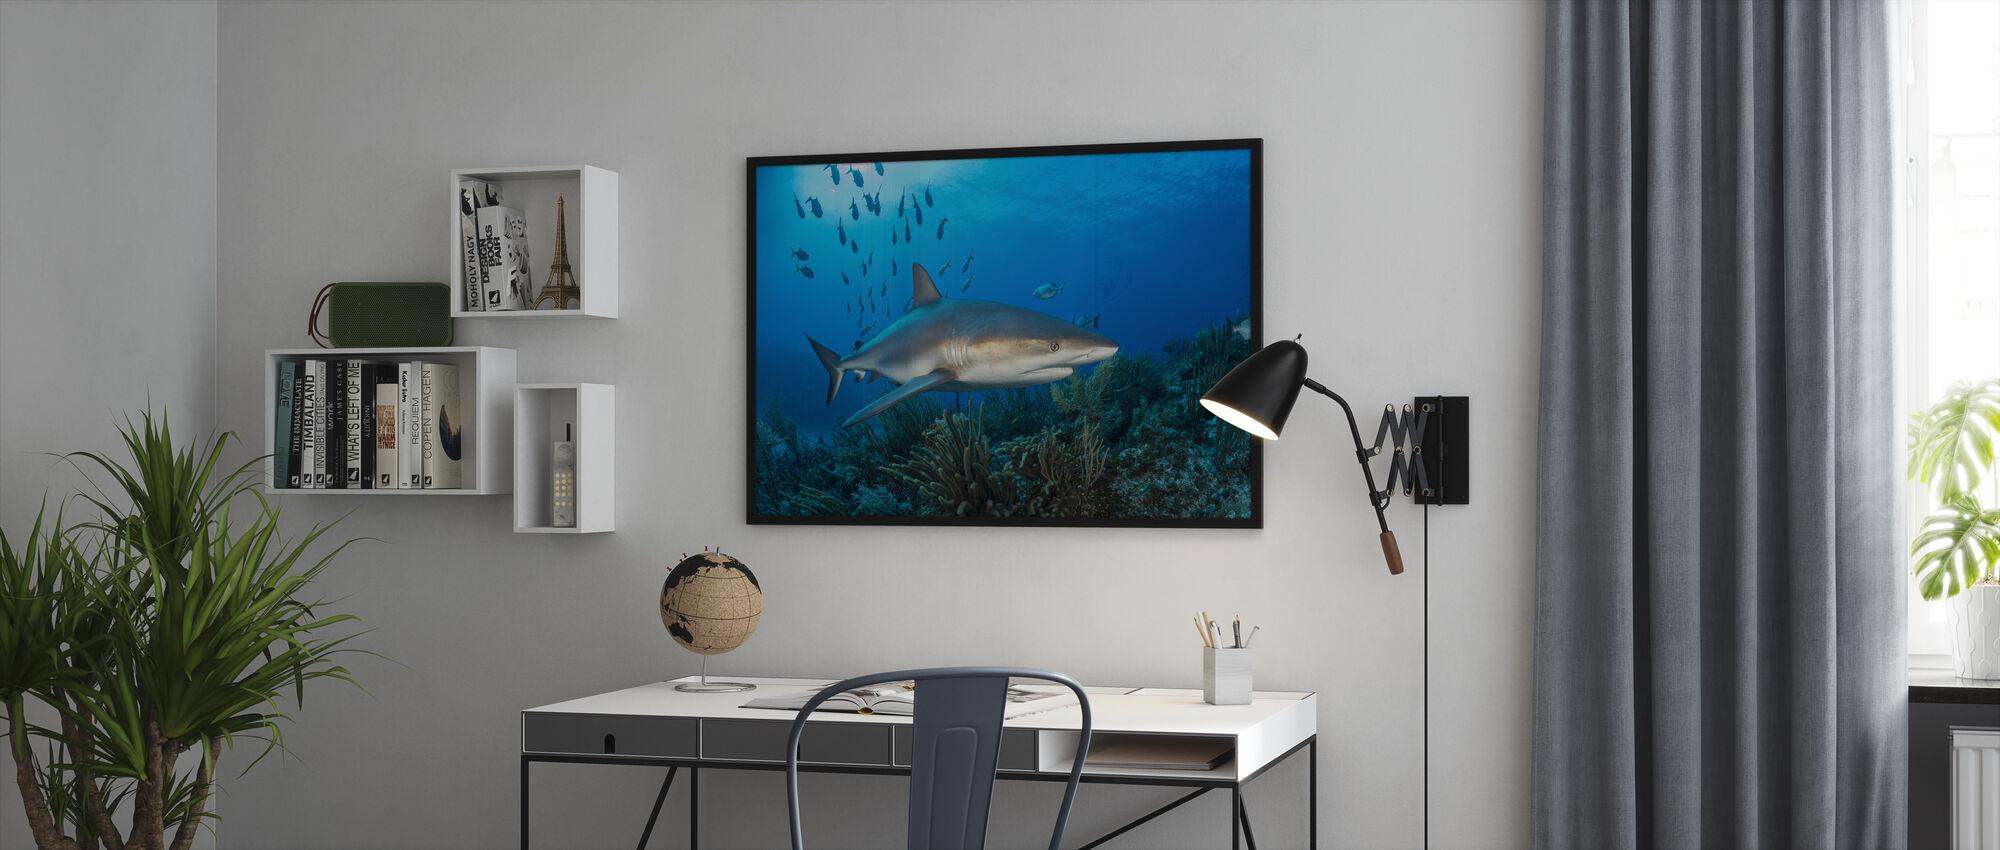 Caribbean Reef Shark - Framed print - Office